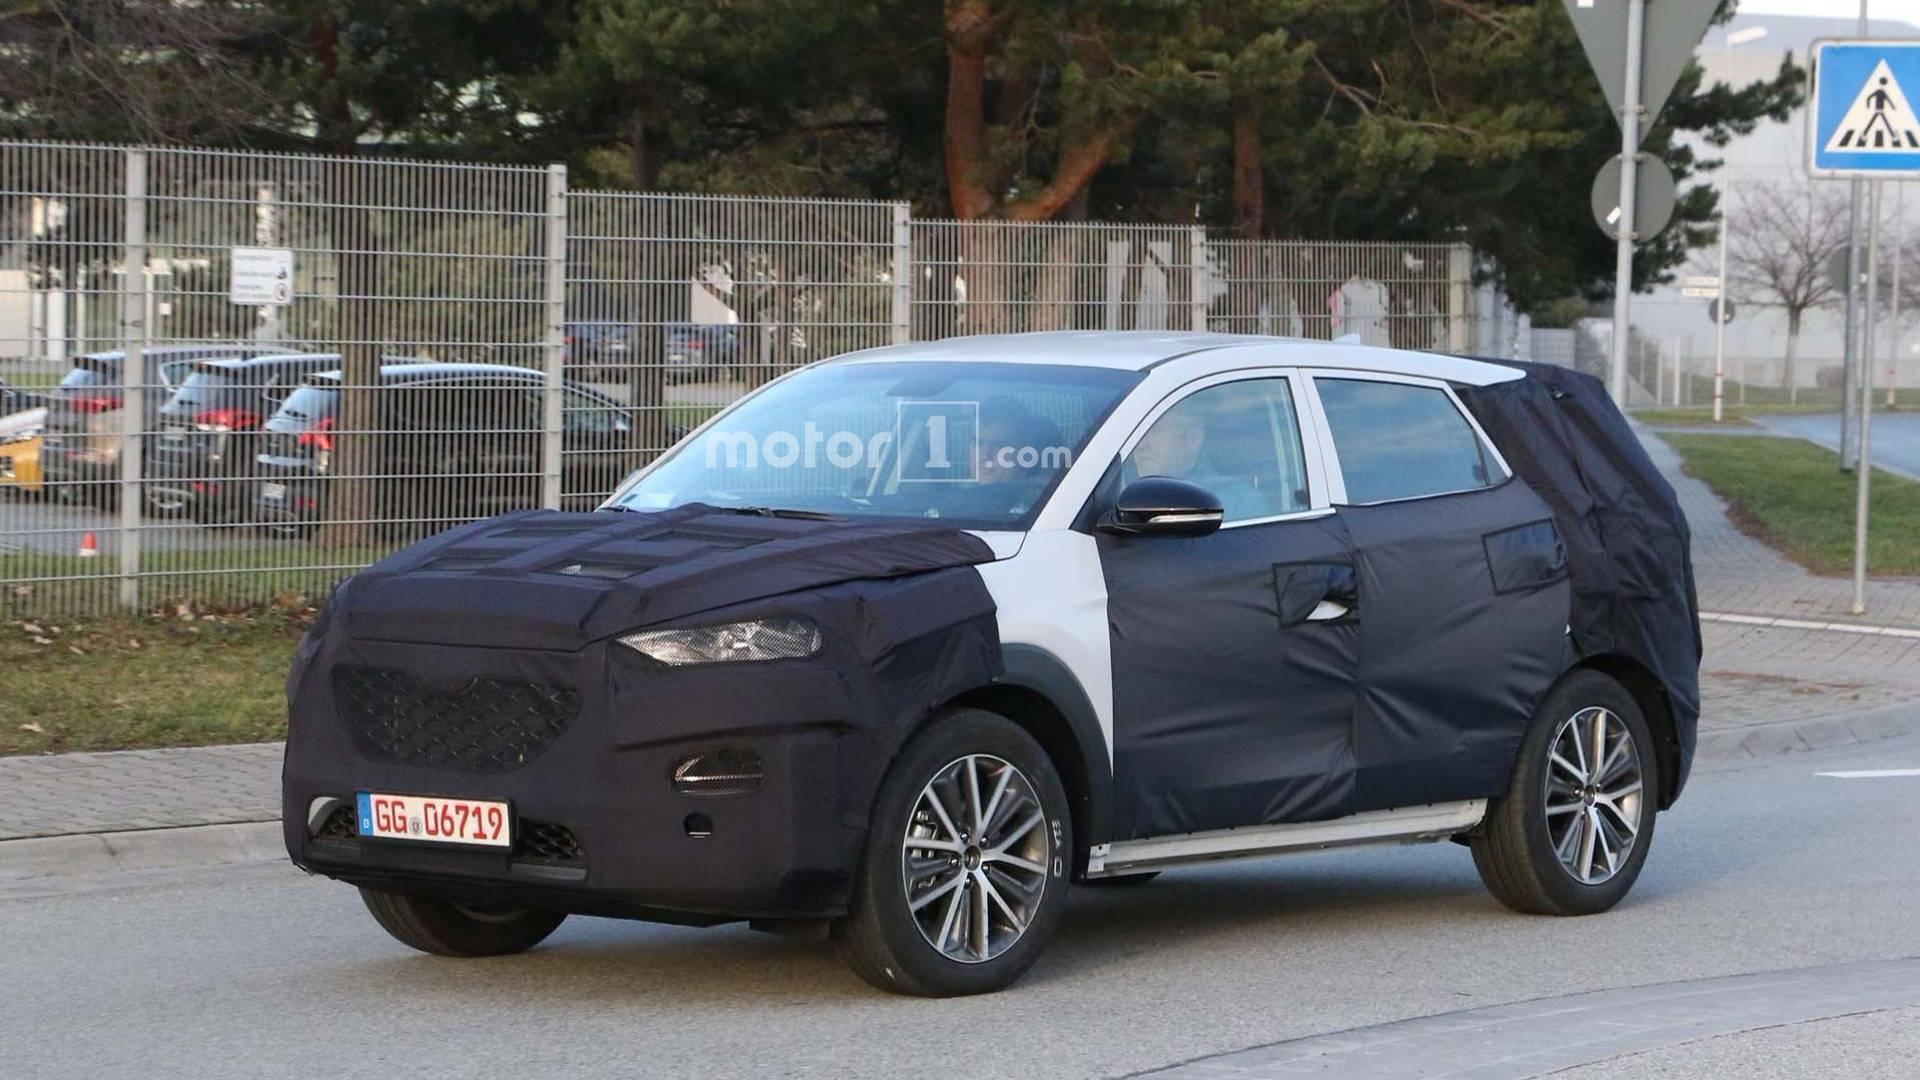 index suvs car in hyundai sidev tl en tucson suv possibilities showroom motor new pip india ext side thinking exterior